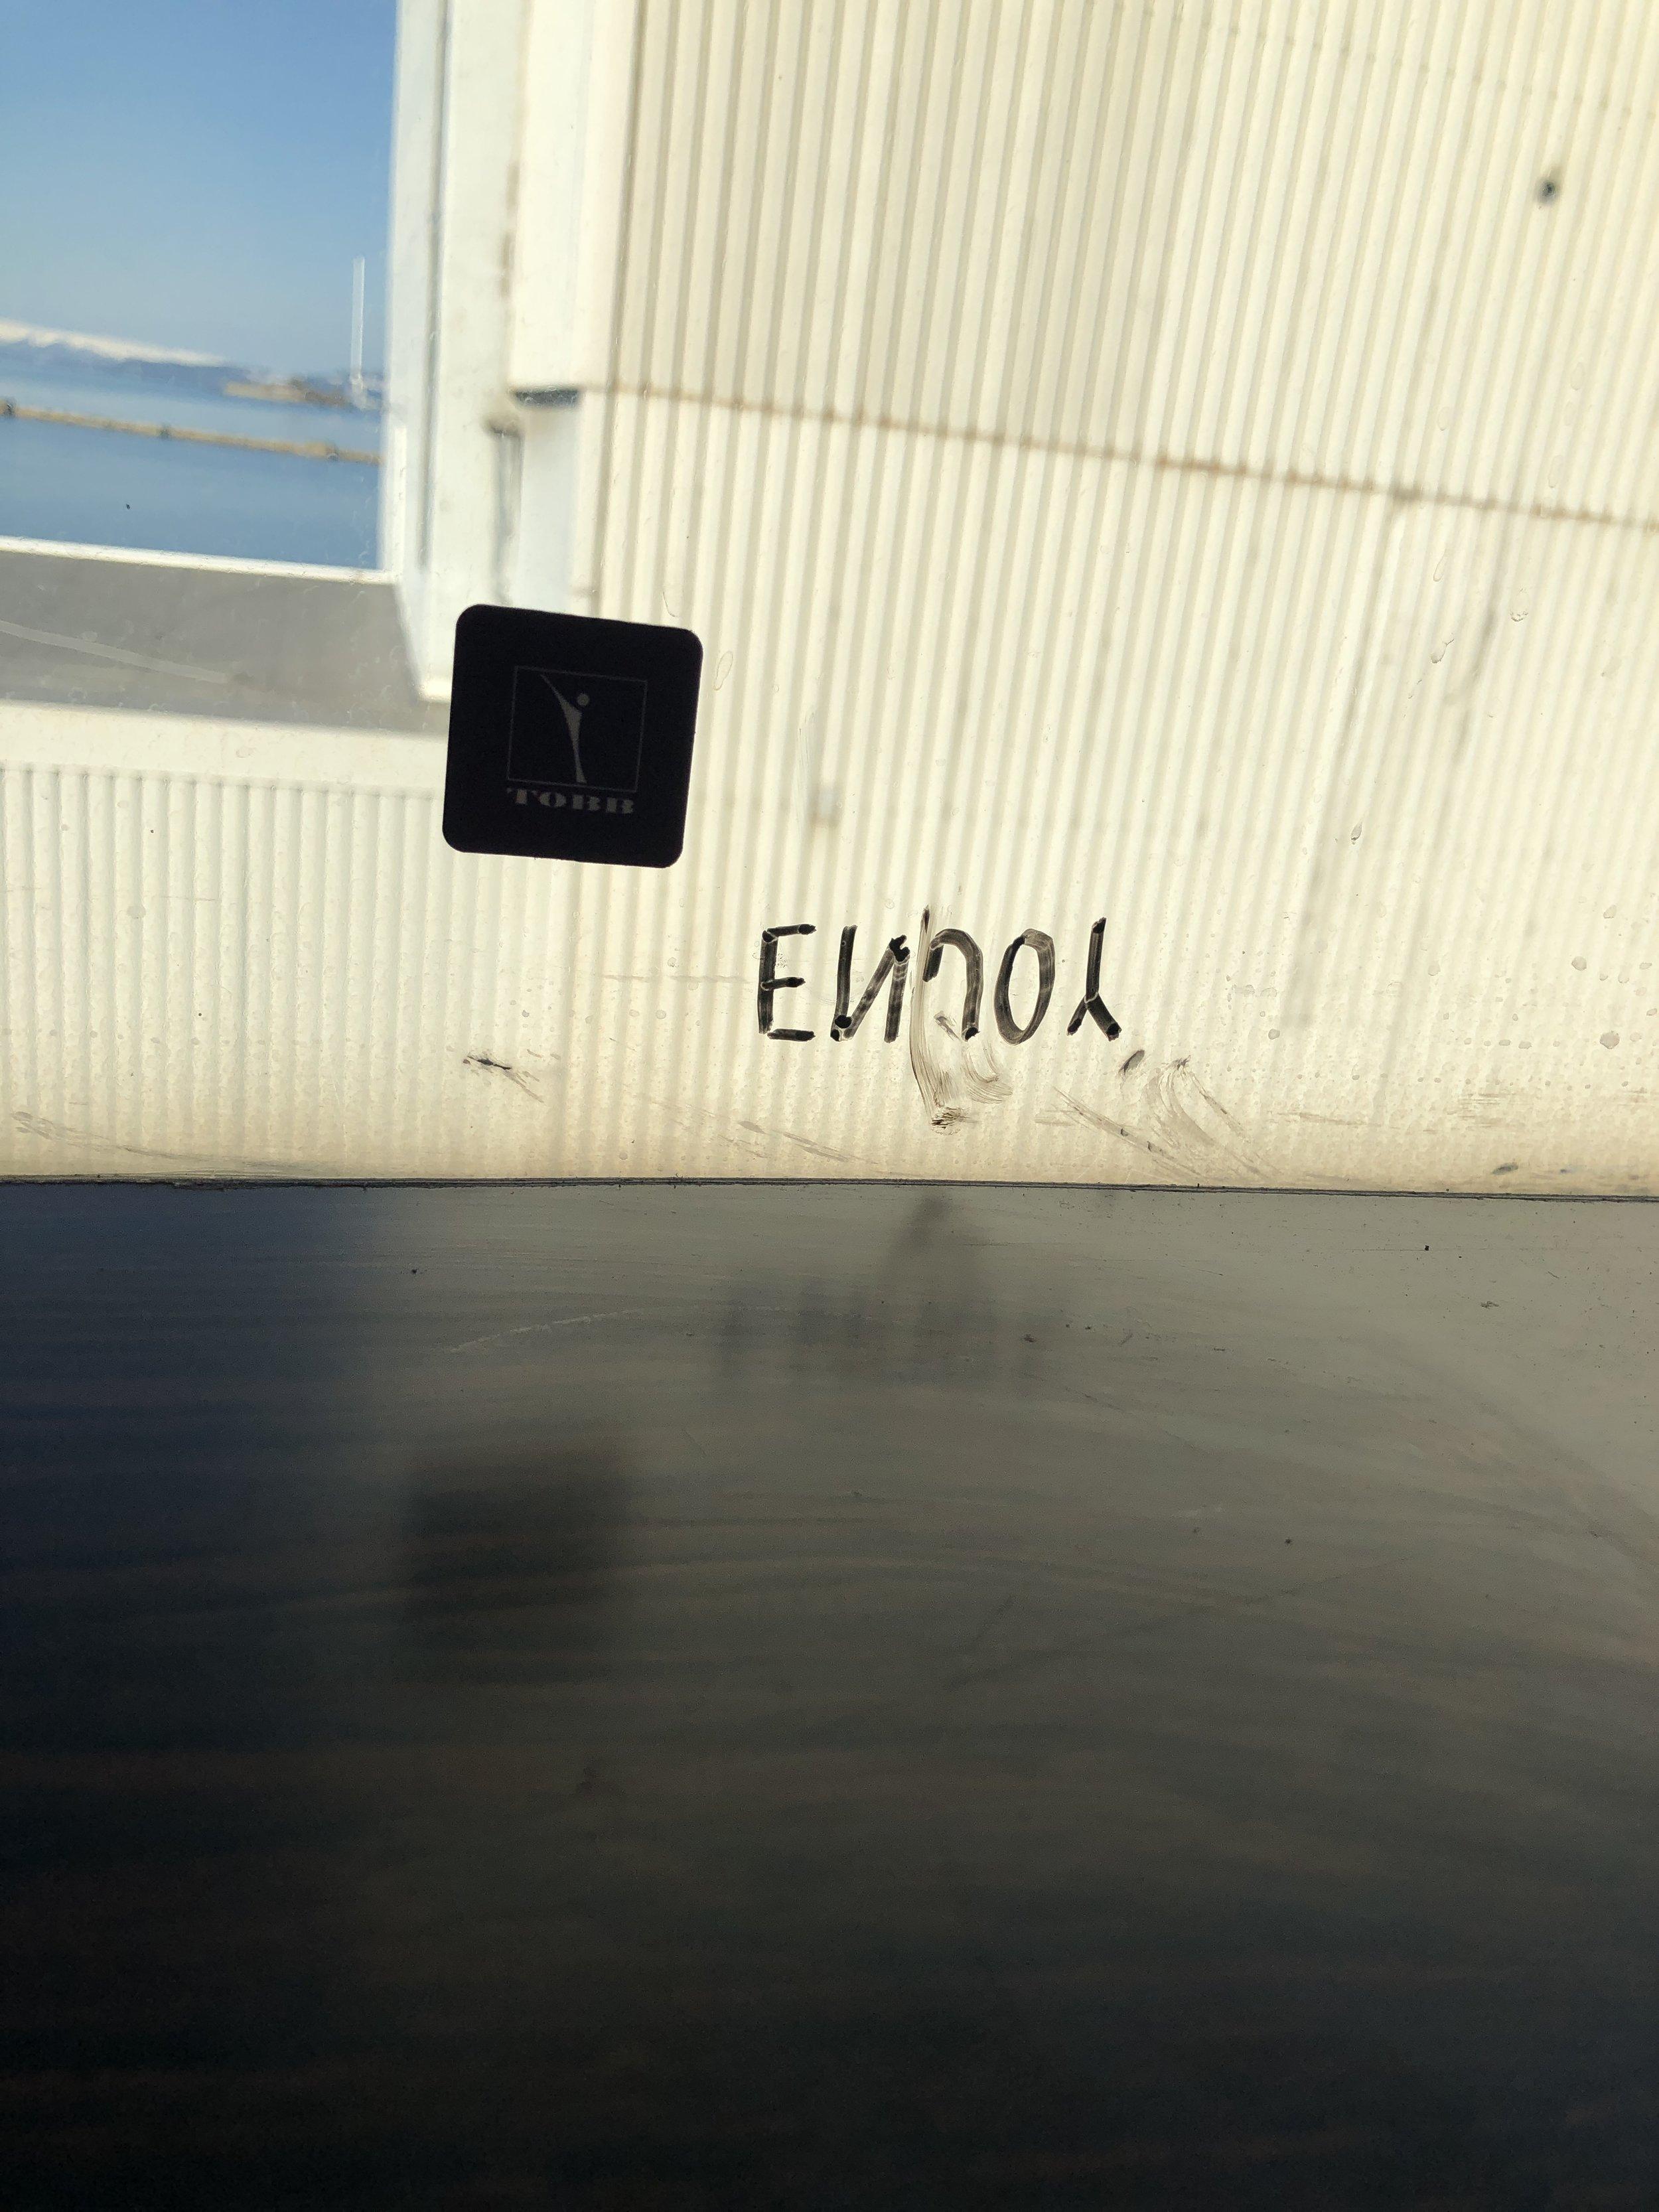 Typografitest på vinduet i atelieret.